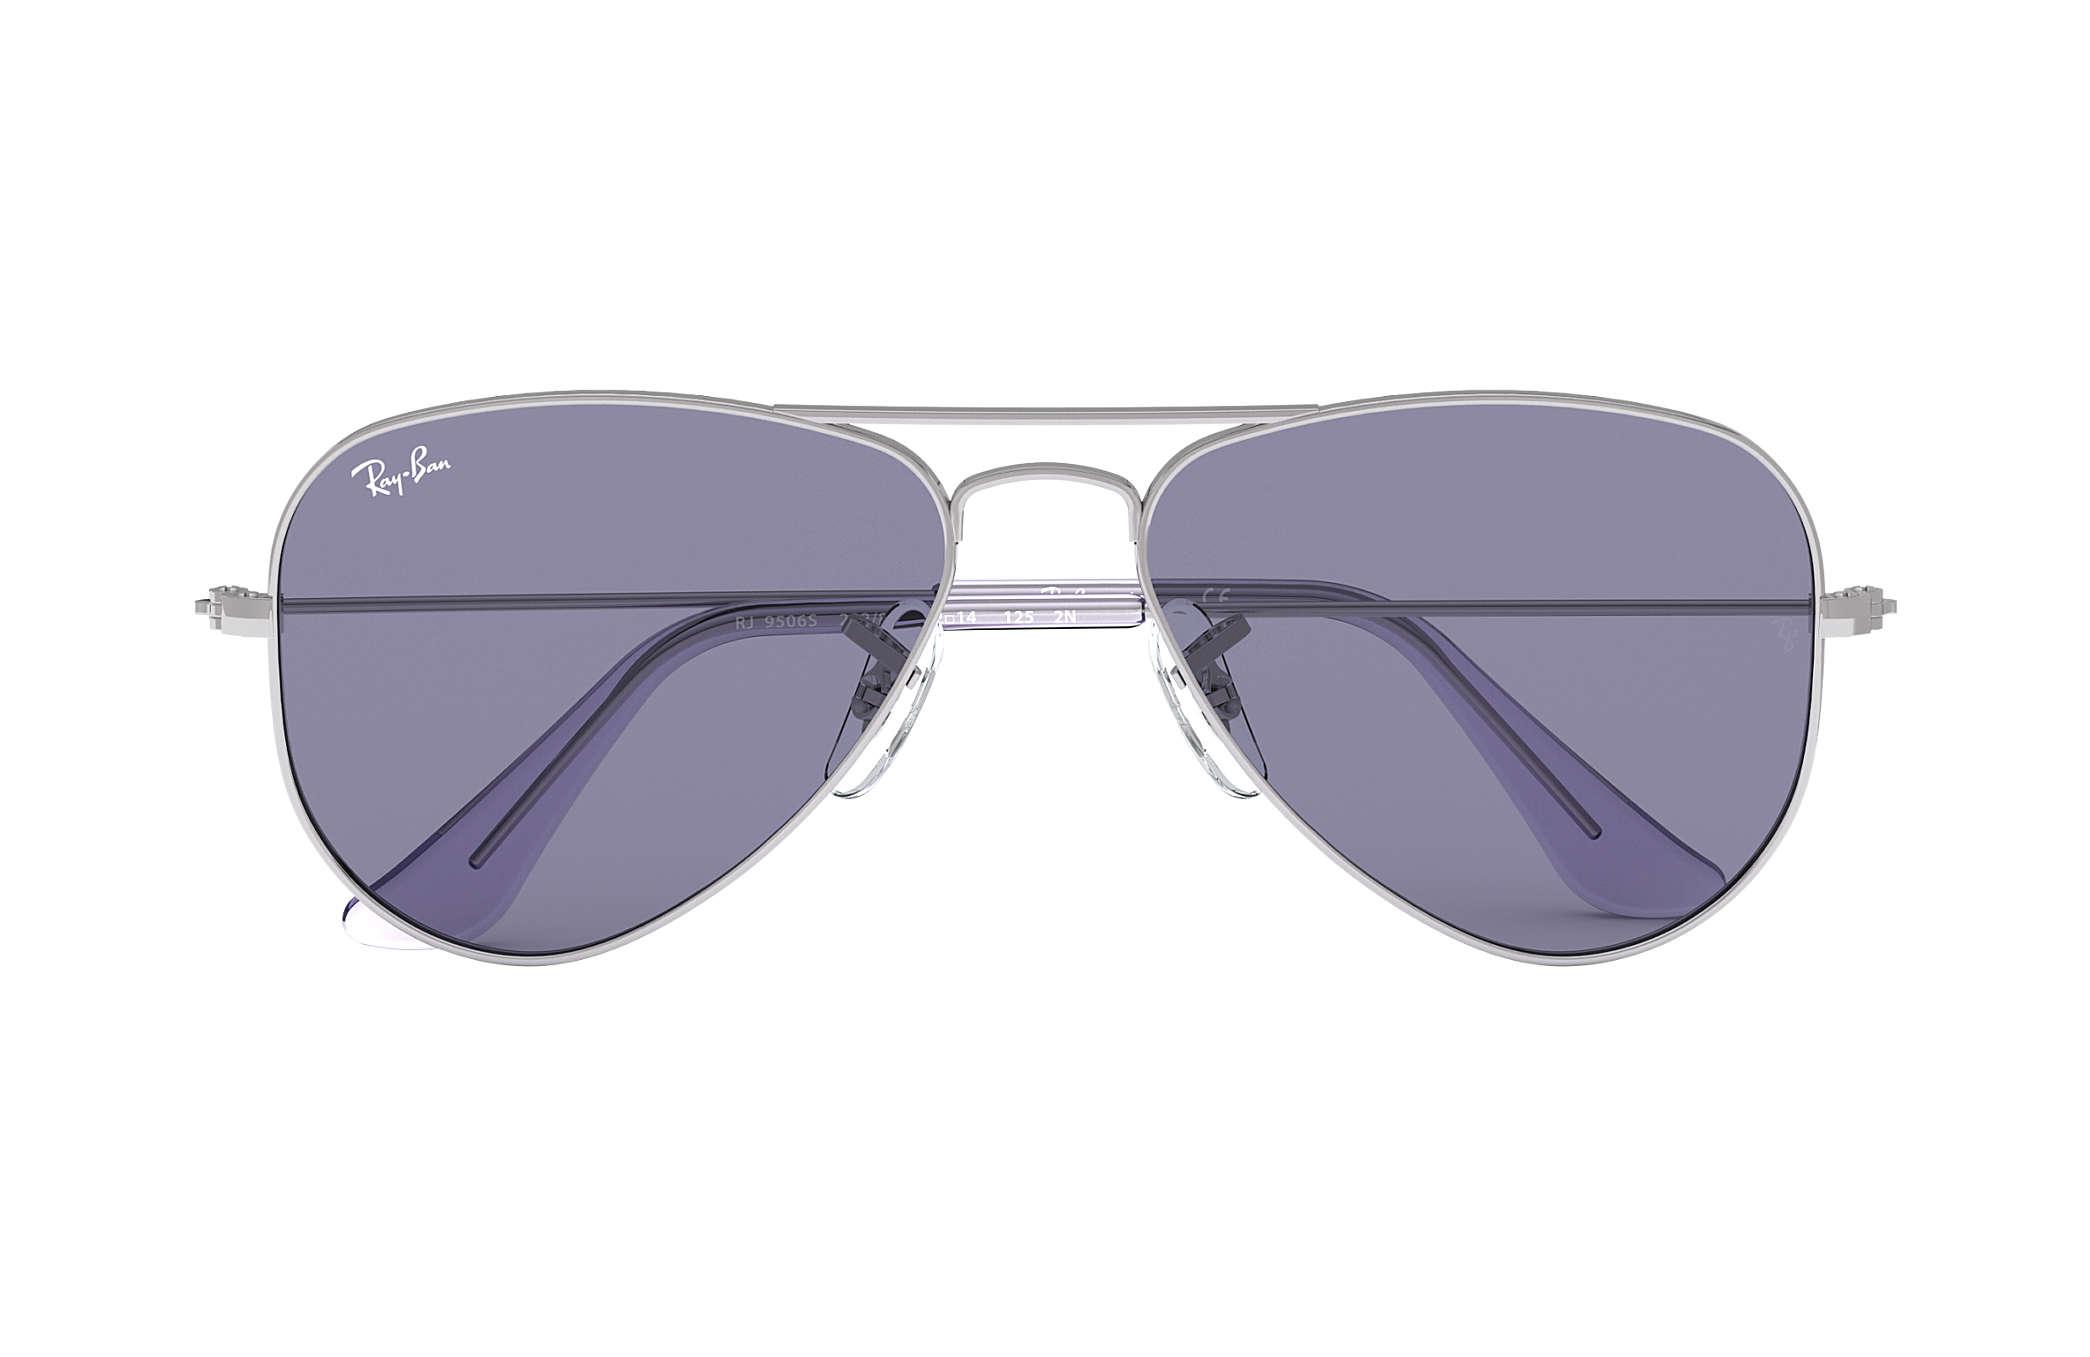 ray ban jr solbriller rj9506s aviator